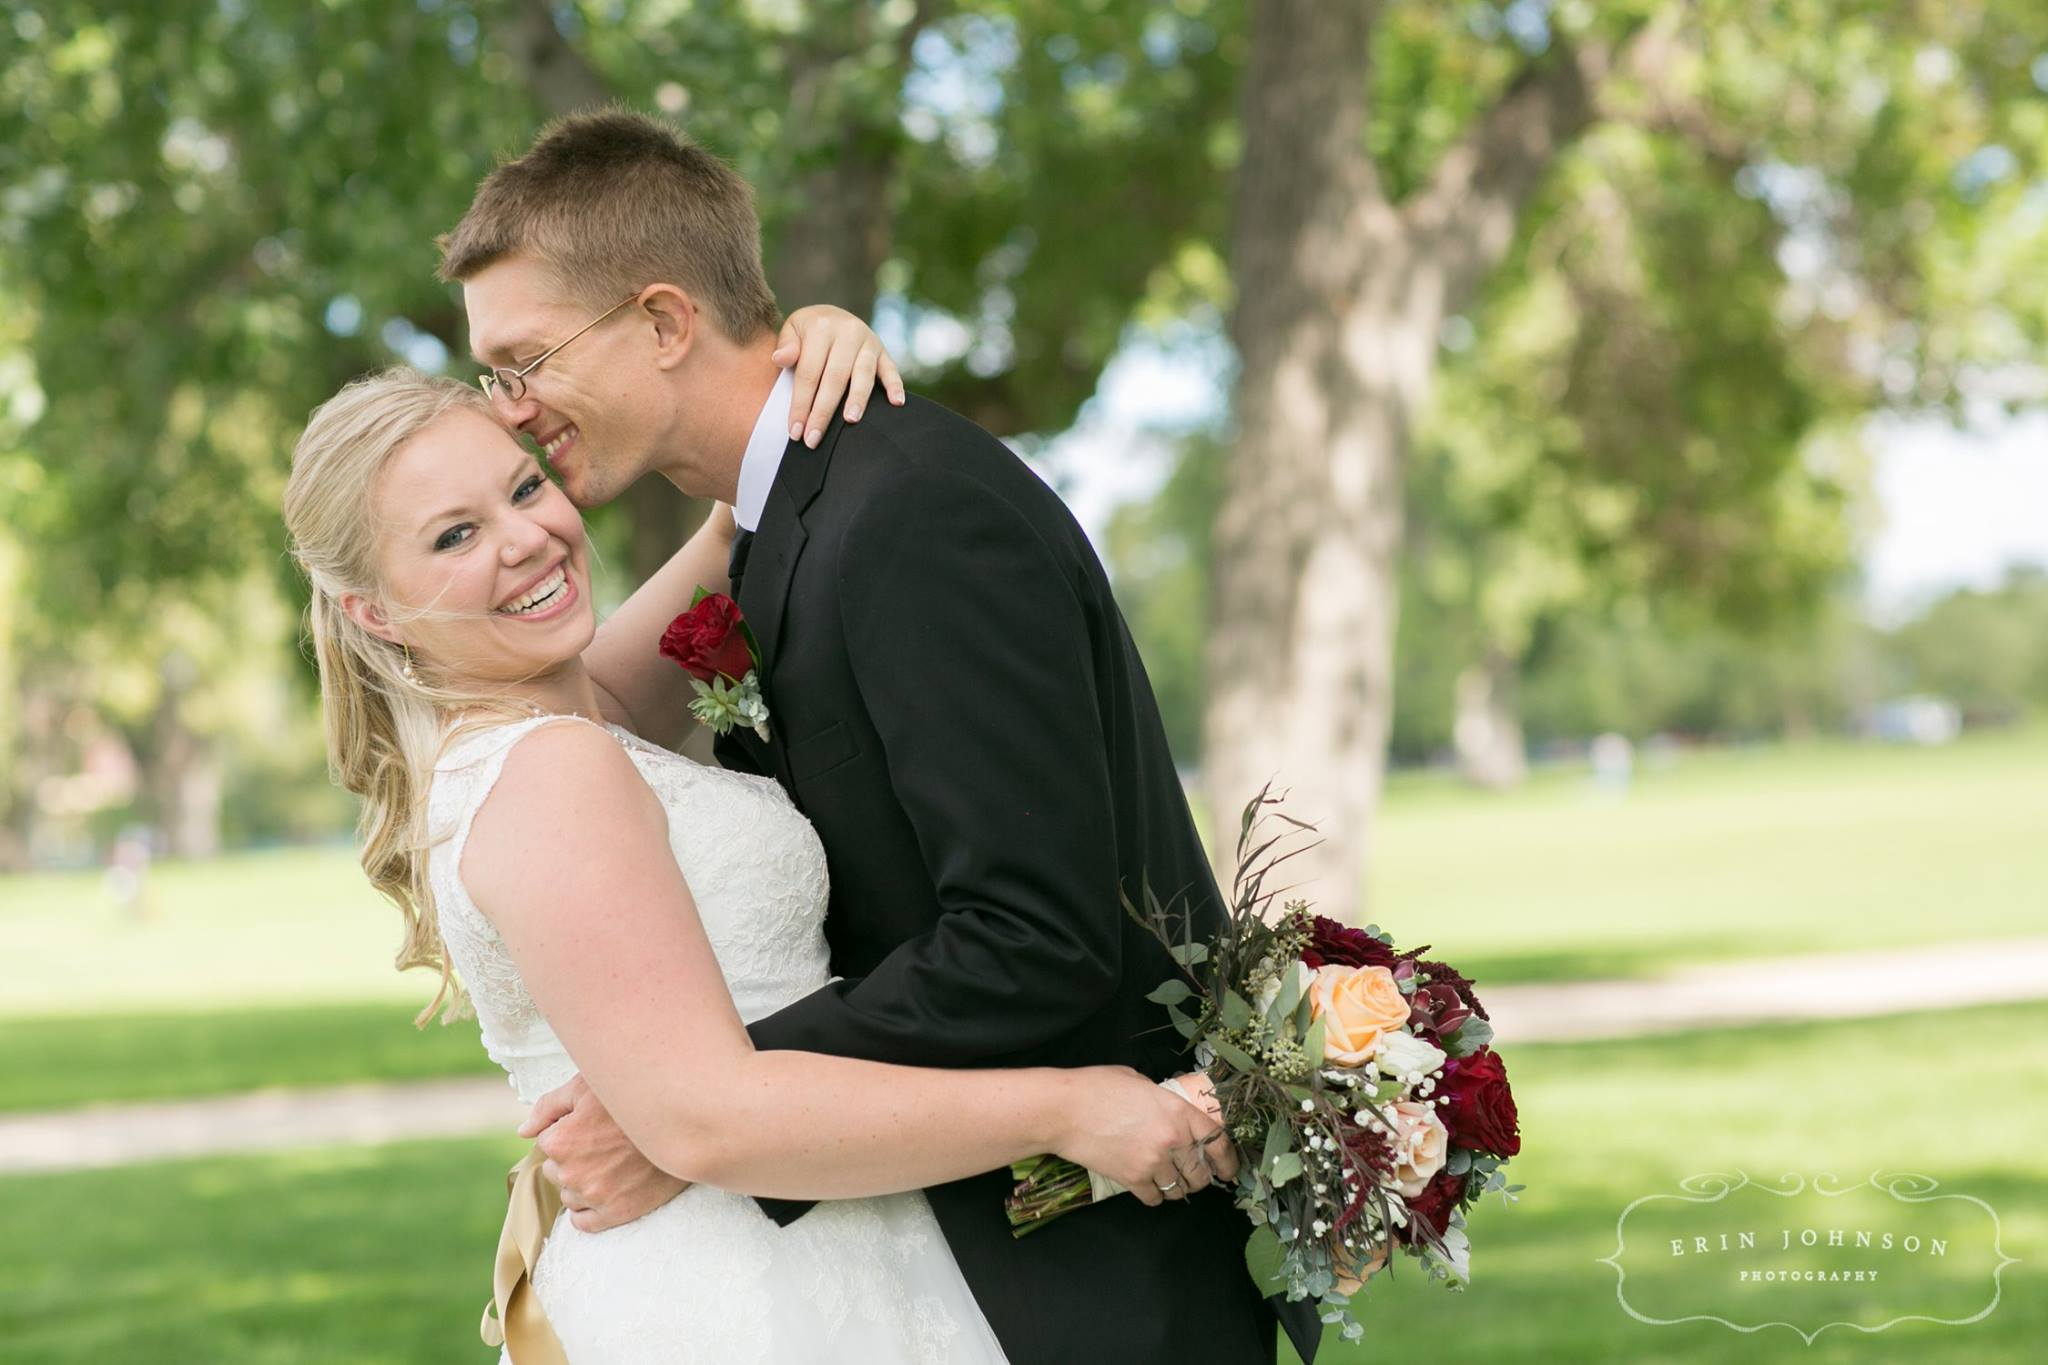 Wedding Day2.jpg